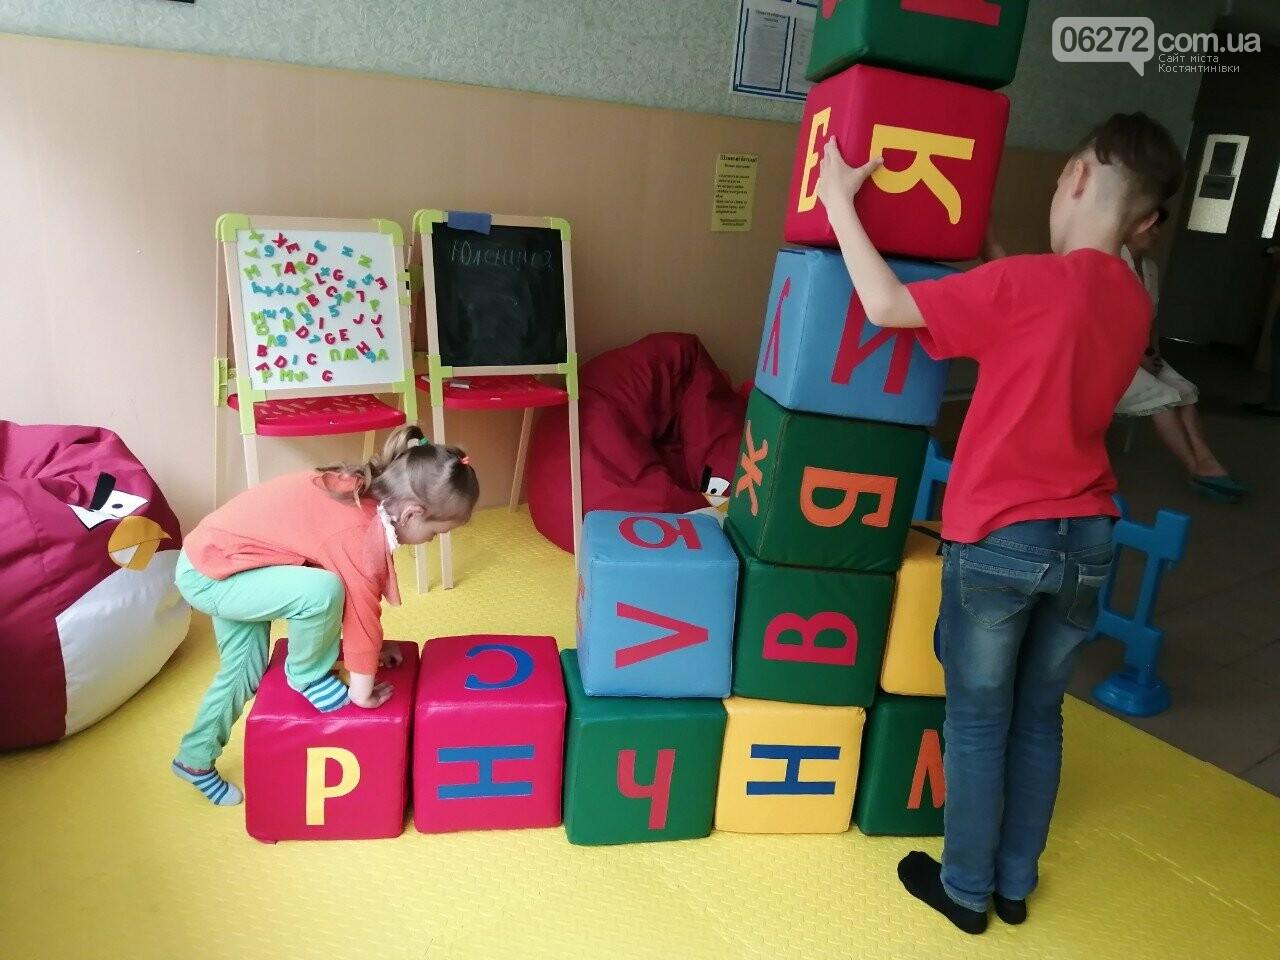 В амбулатории Константиновки установили детскую площадку, фото-2